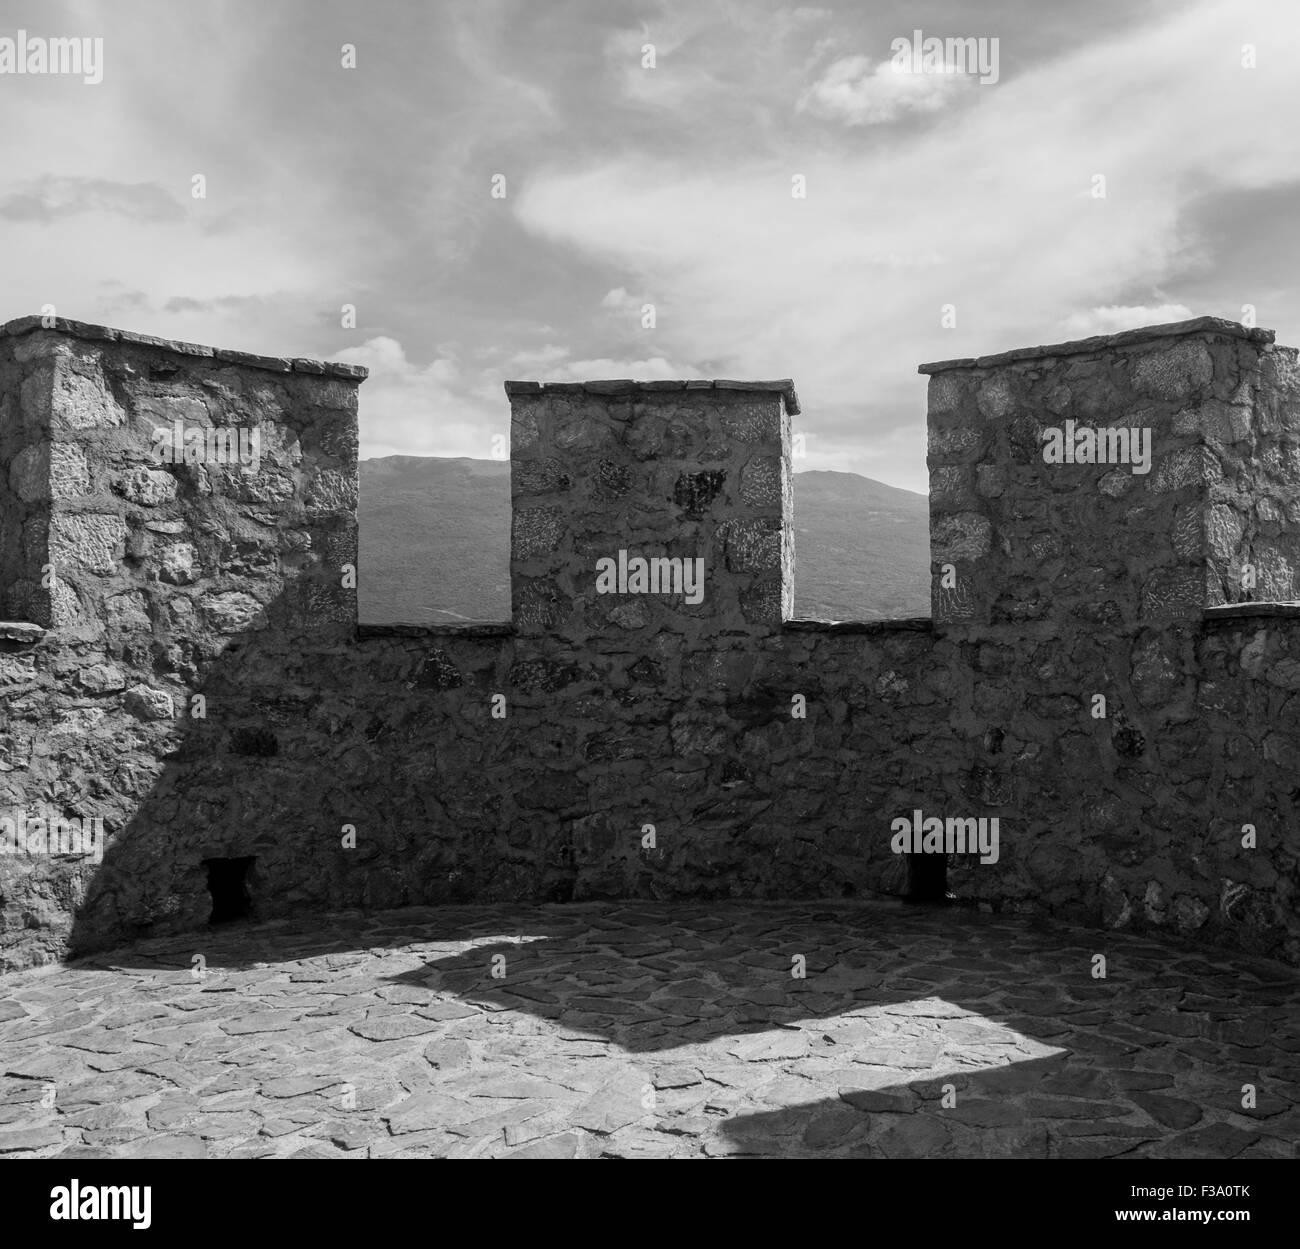 Symmetrical Castle turrets - Stock Image